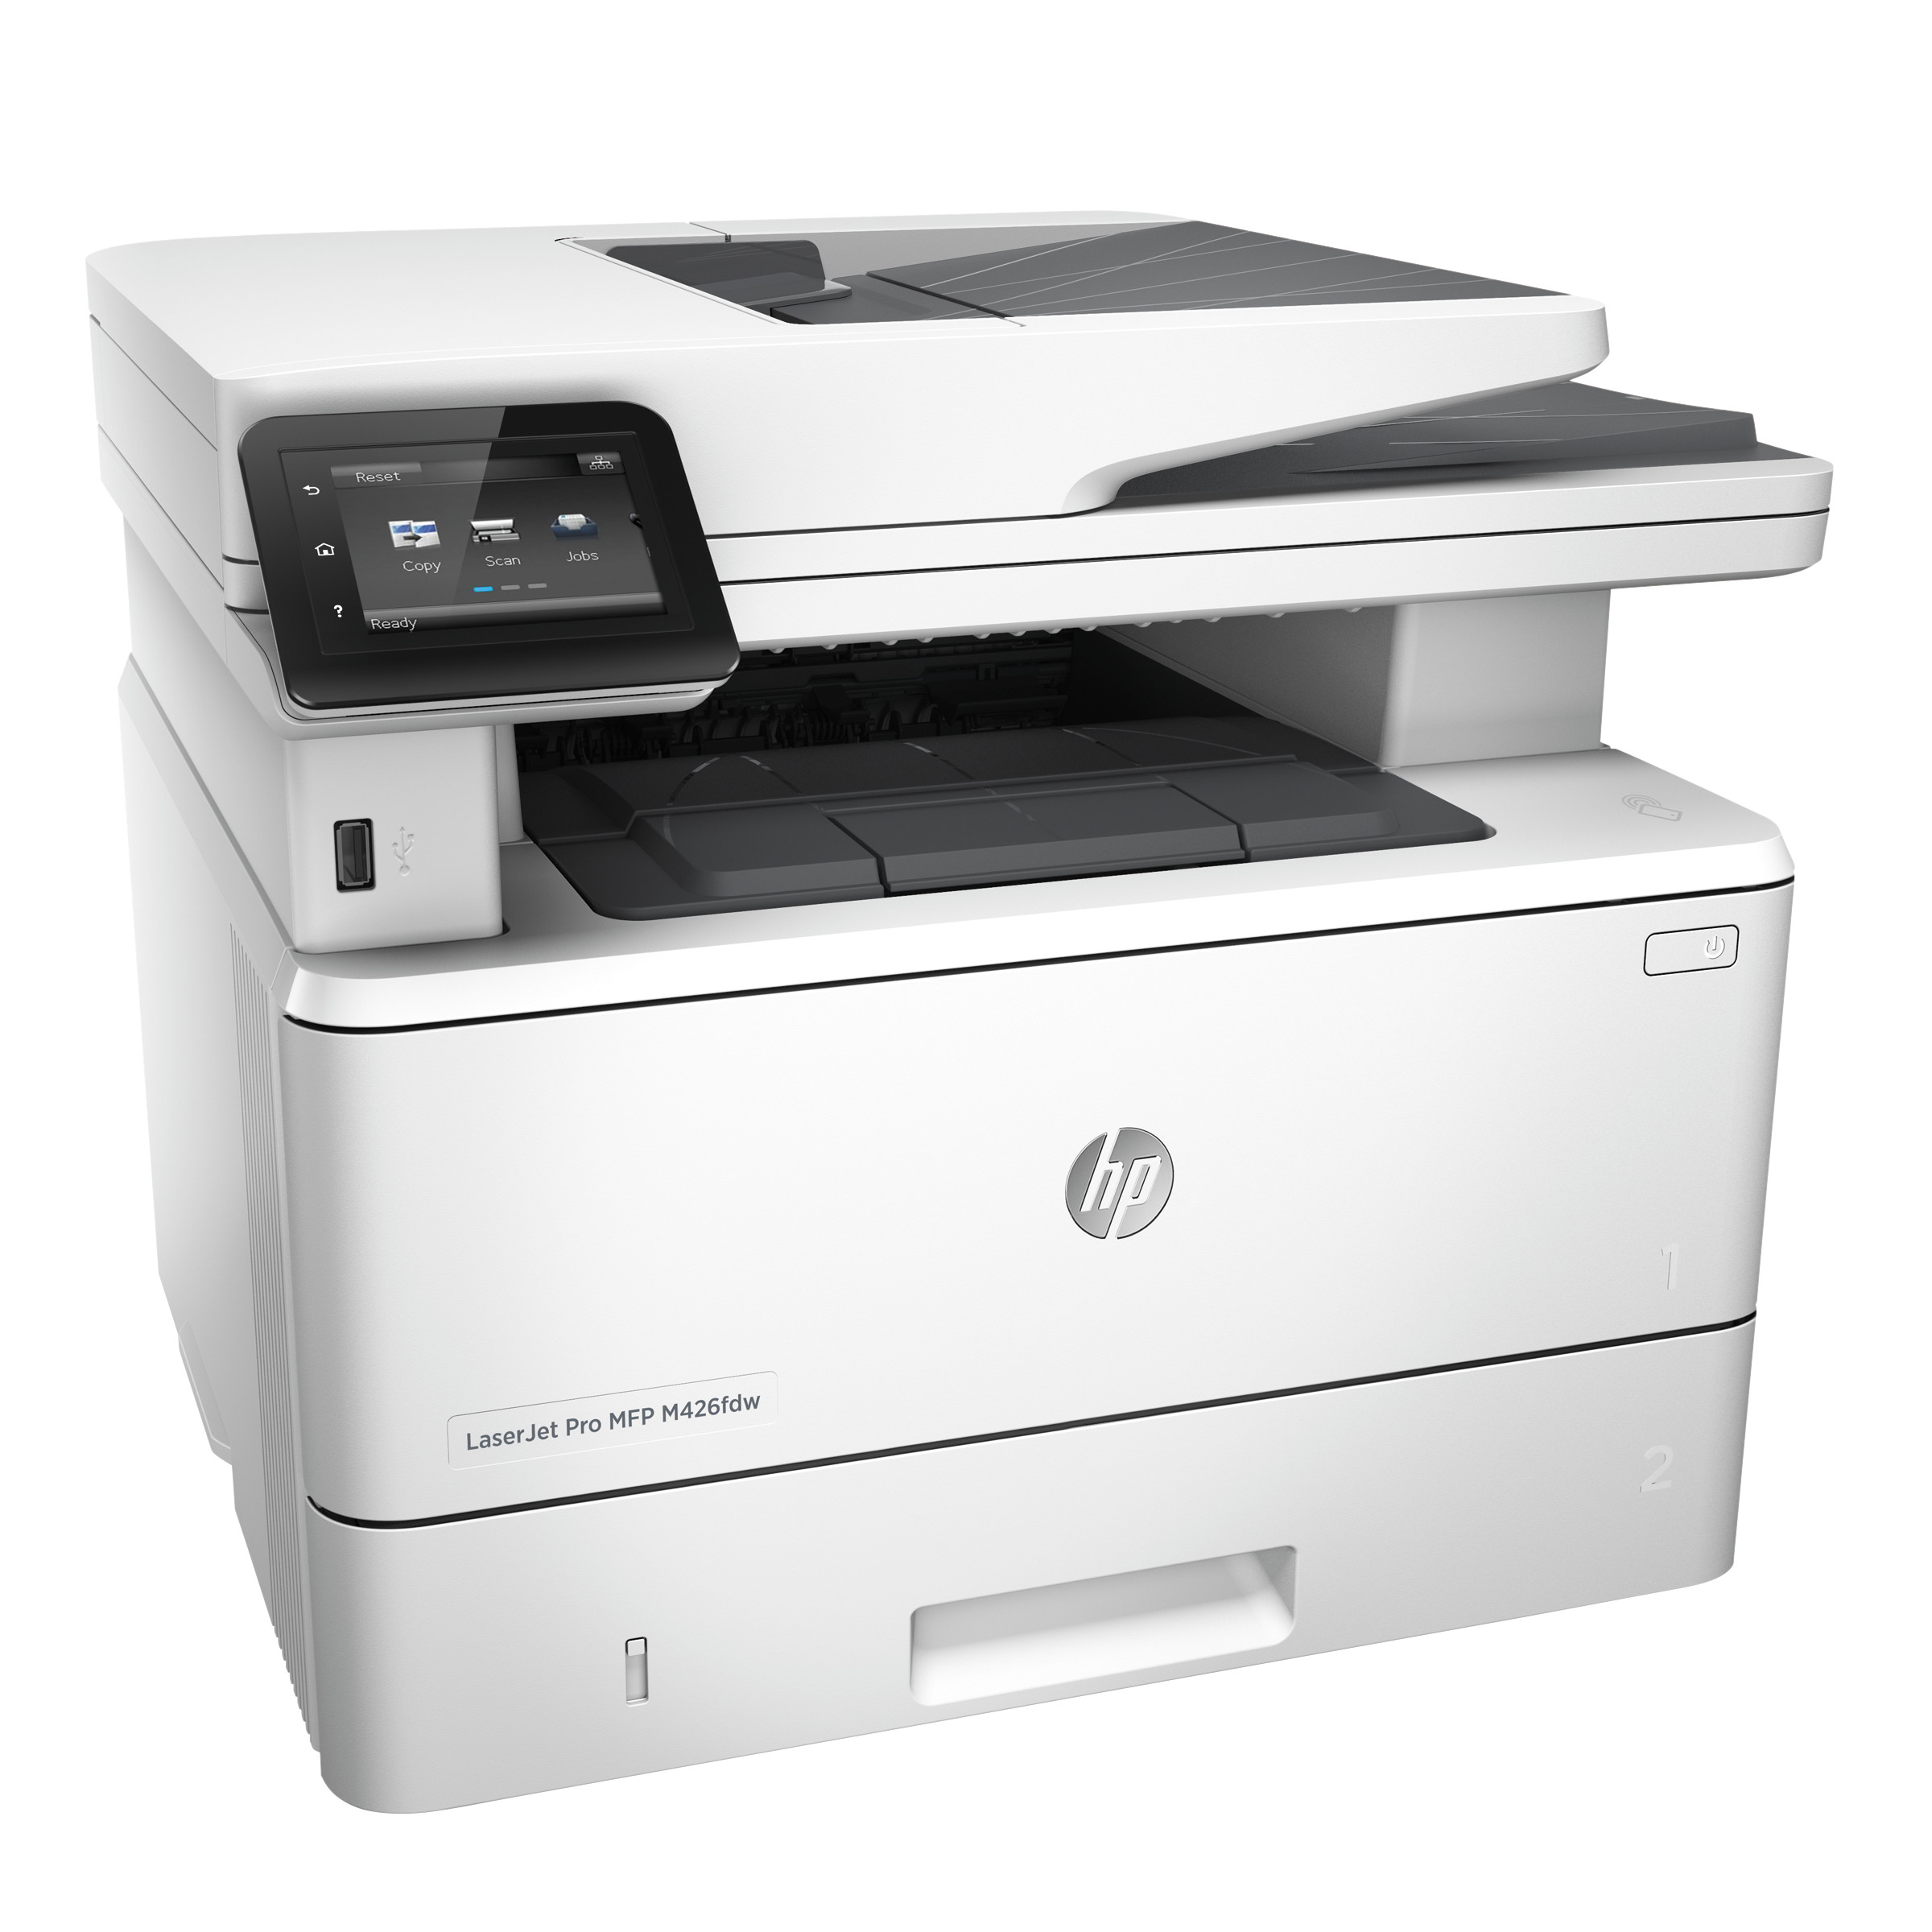 HP LaserJet Pro MFP M426FDW Wireless Multifunction Printer, Copy/Fax/Print/